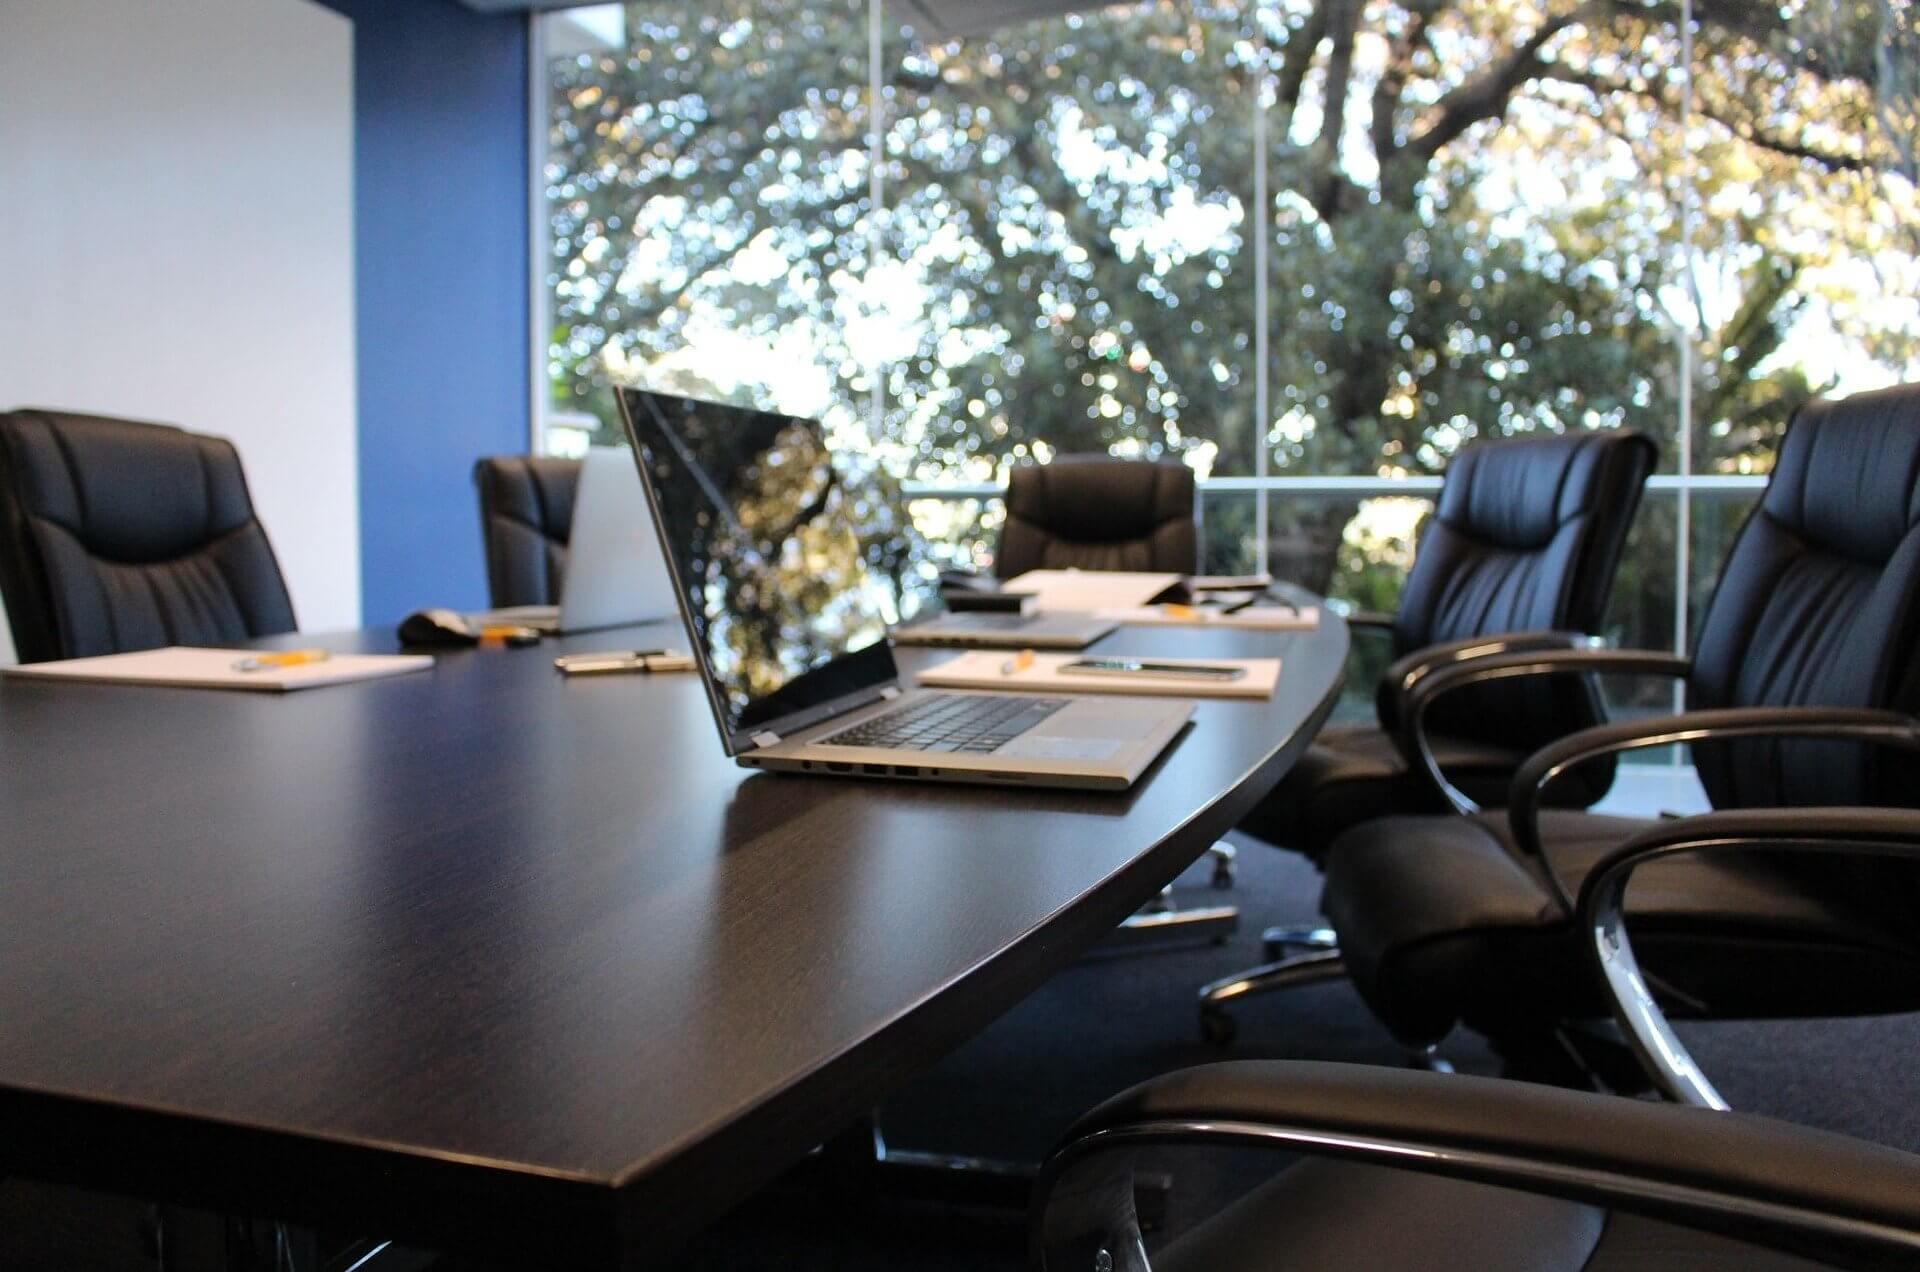 CFI & co une équipe d'expert en financement